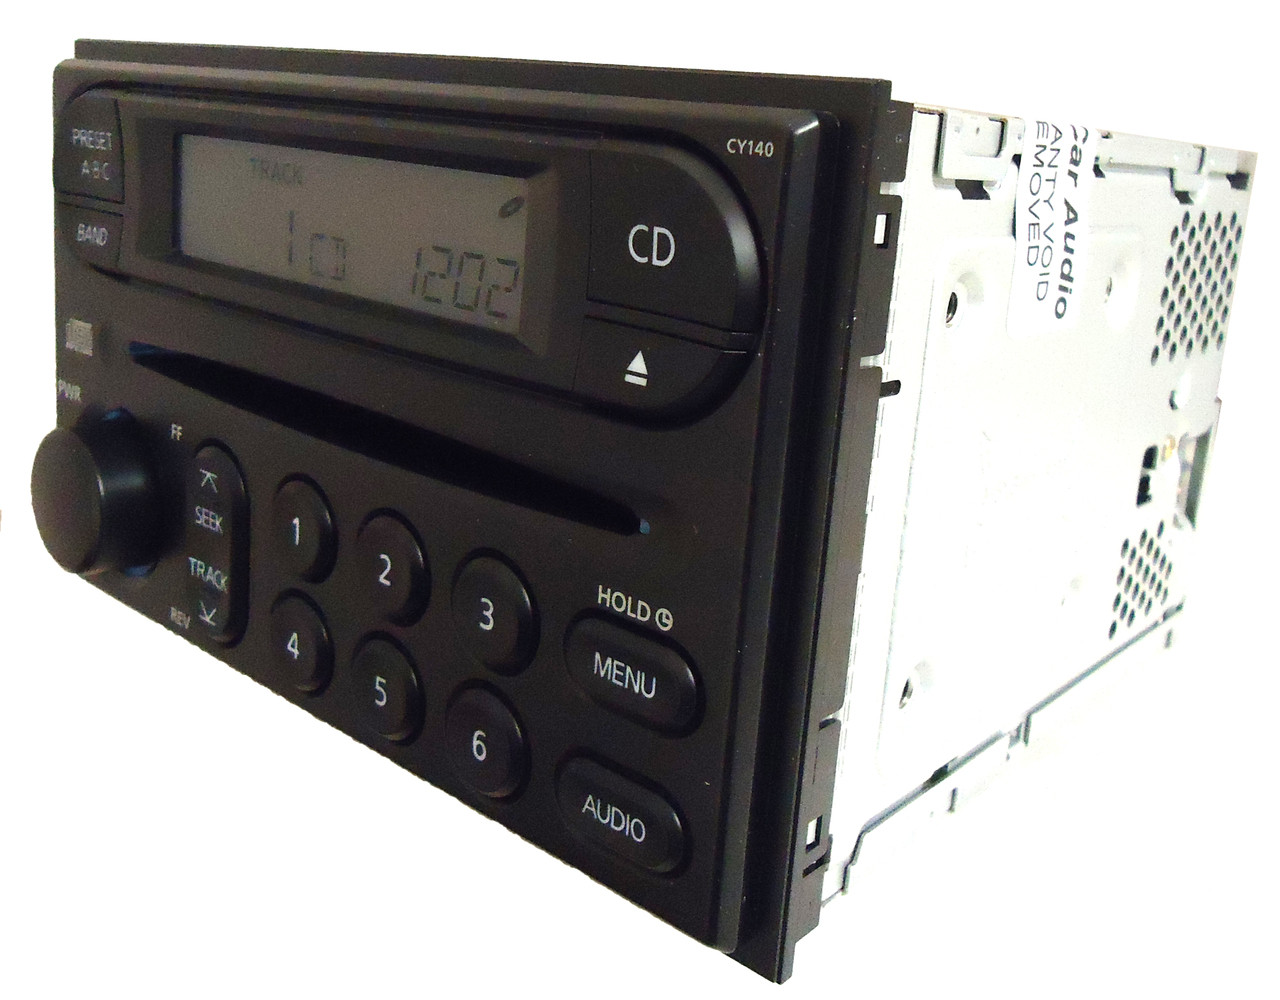 2004 nissan xterra rockford fosgate stereo wiring diagram moroso switch panel new 01 02 03 04 frontier radio cd player